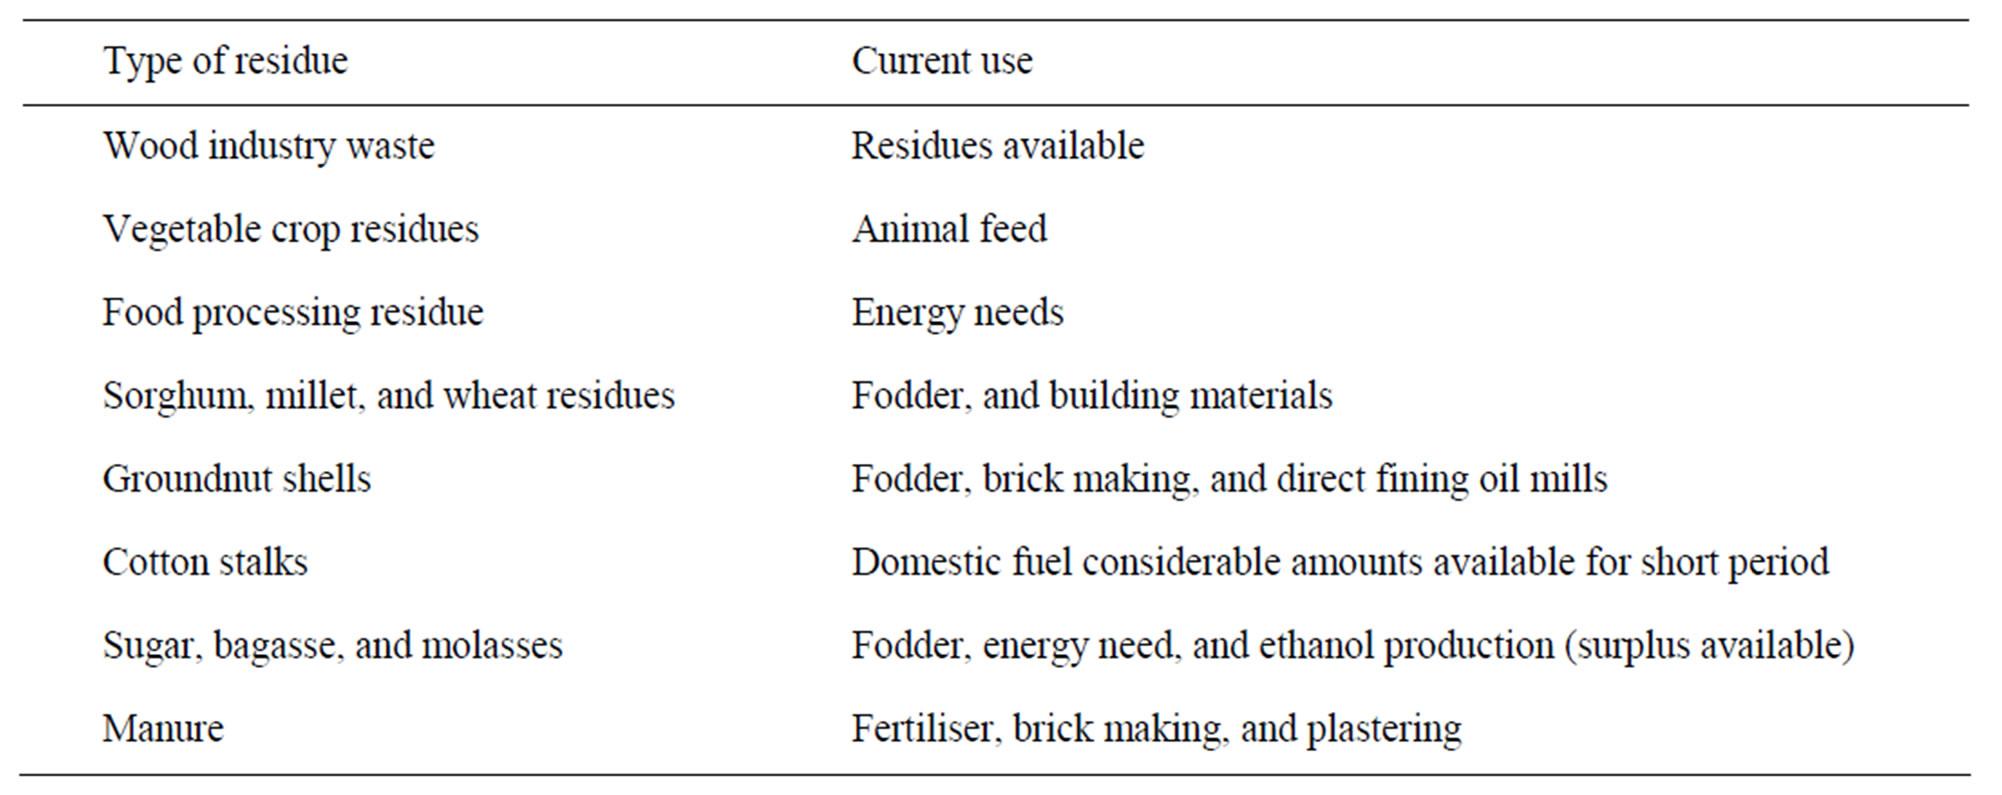 Biomass energy resources utilisation and waste management